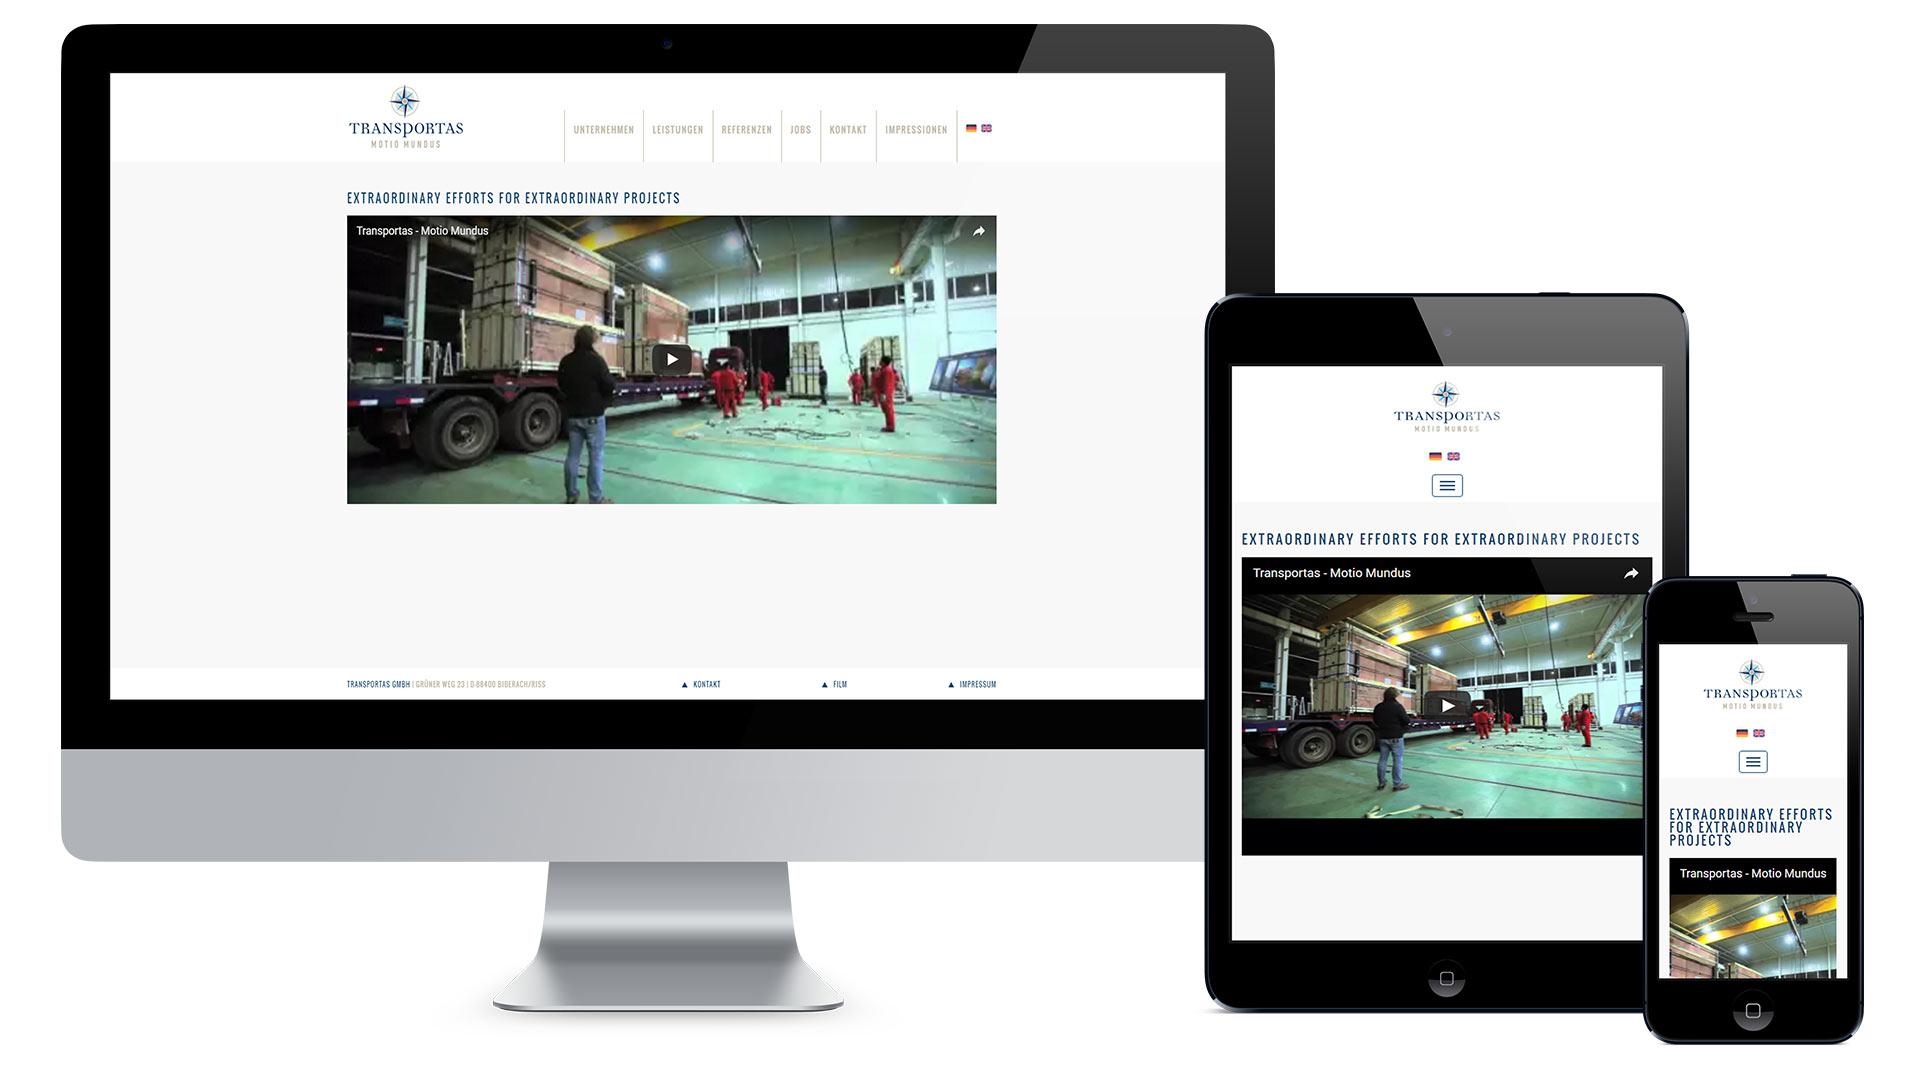 Transportas Internationale Spedition GmbH Web